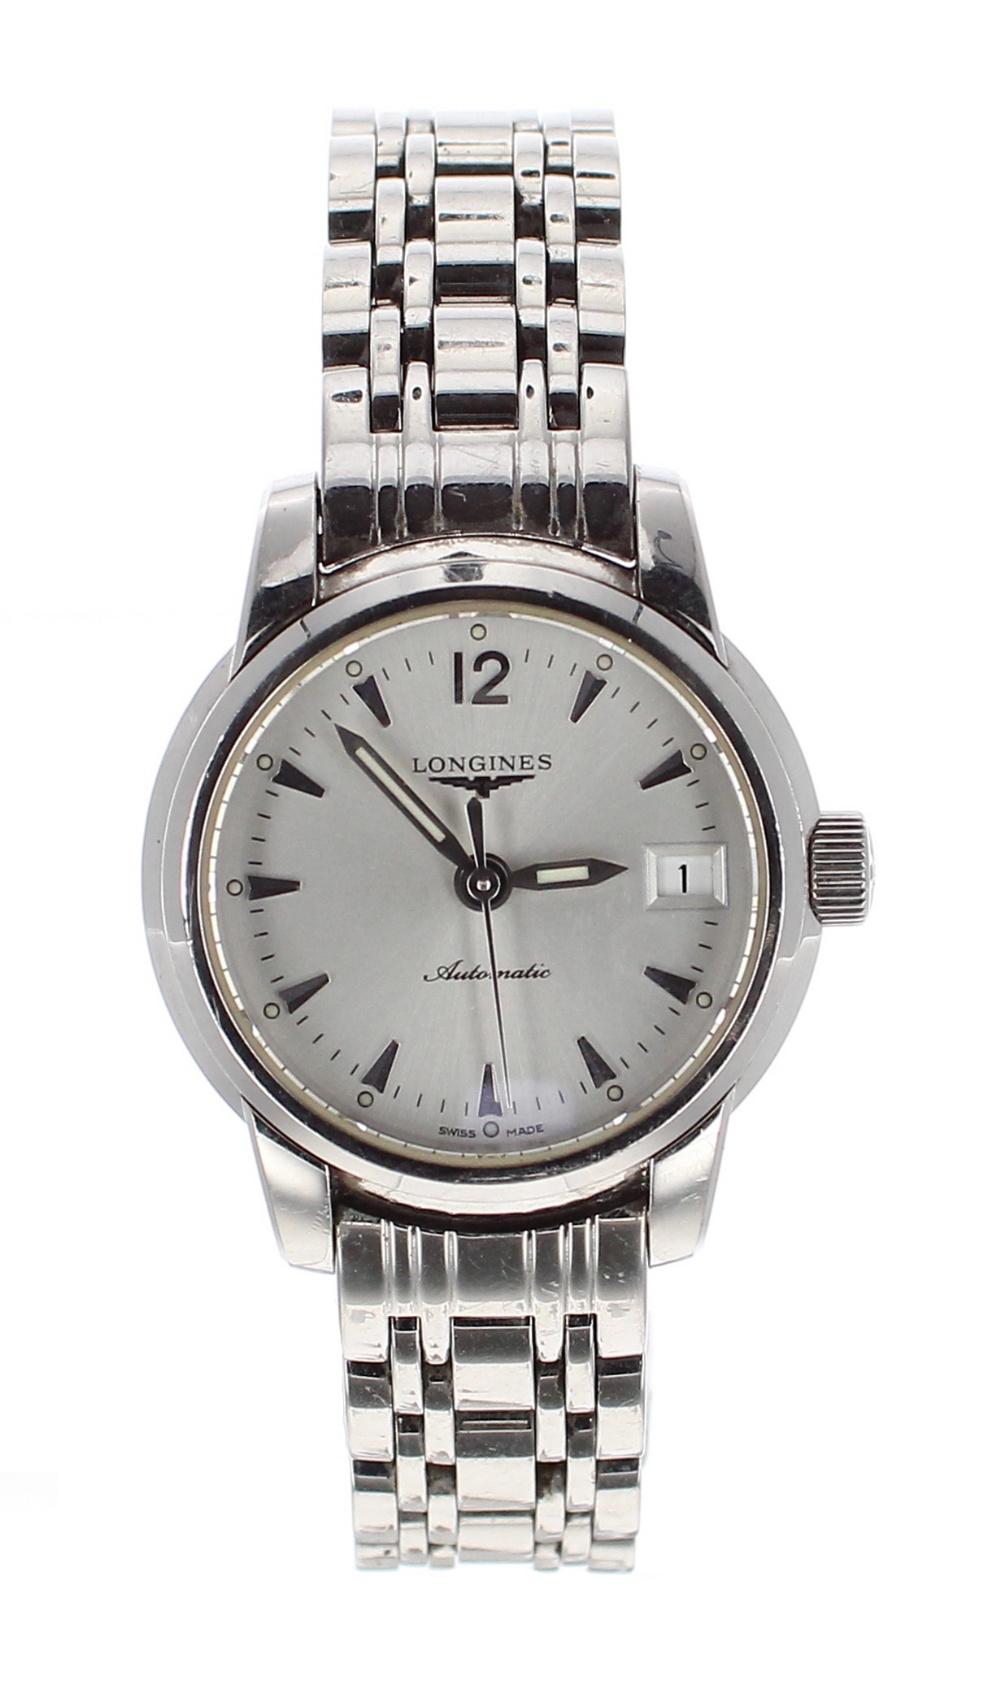 Lot 53 - Longines Saint-Imier automatic stainless steel lady's bracelet watch, ref. L2.263.4, circular